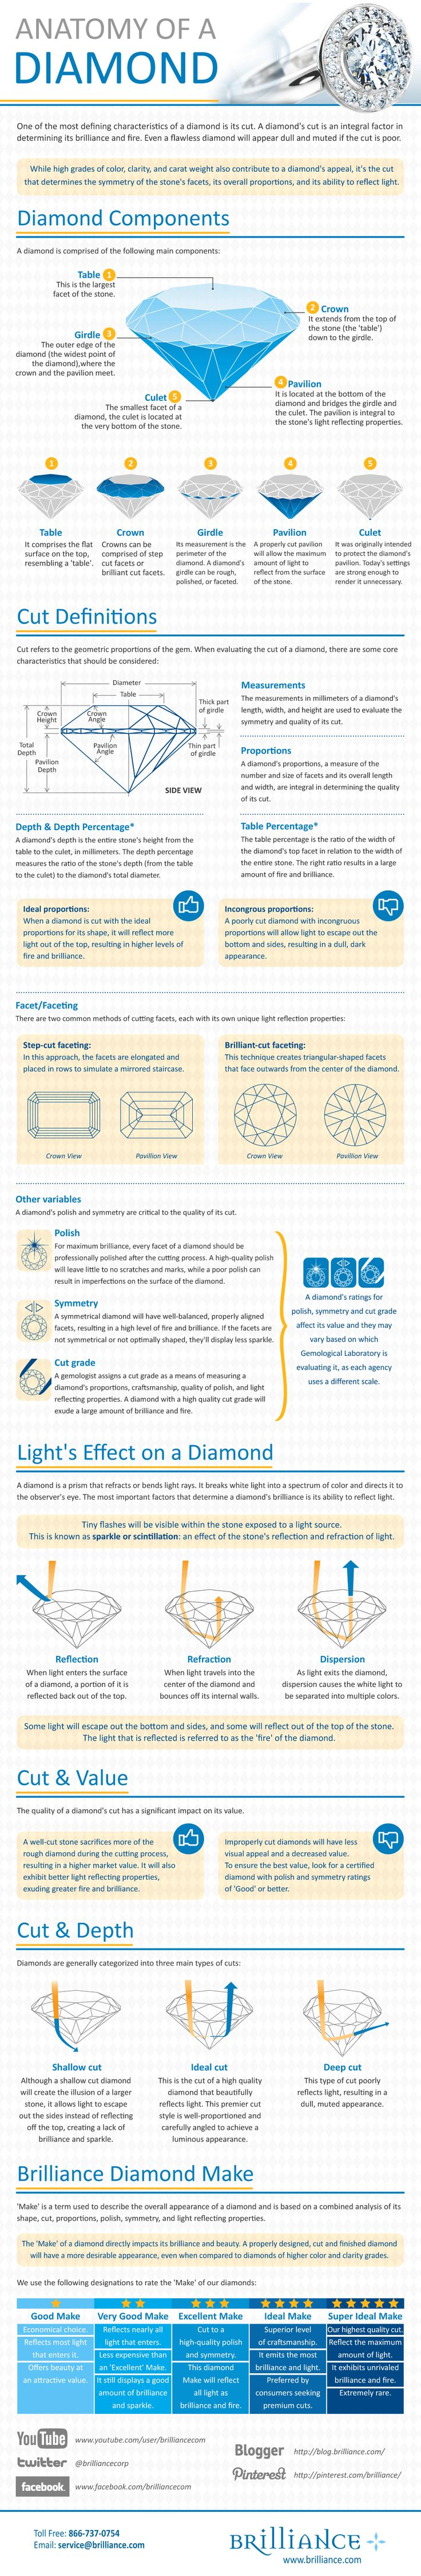 Anatomy of a Diamond - infographics from Brilliance.com c/o http://www.jewelsdujour.com/2012/10/infographic-the-history-of-a-diamond/#